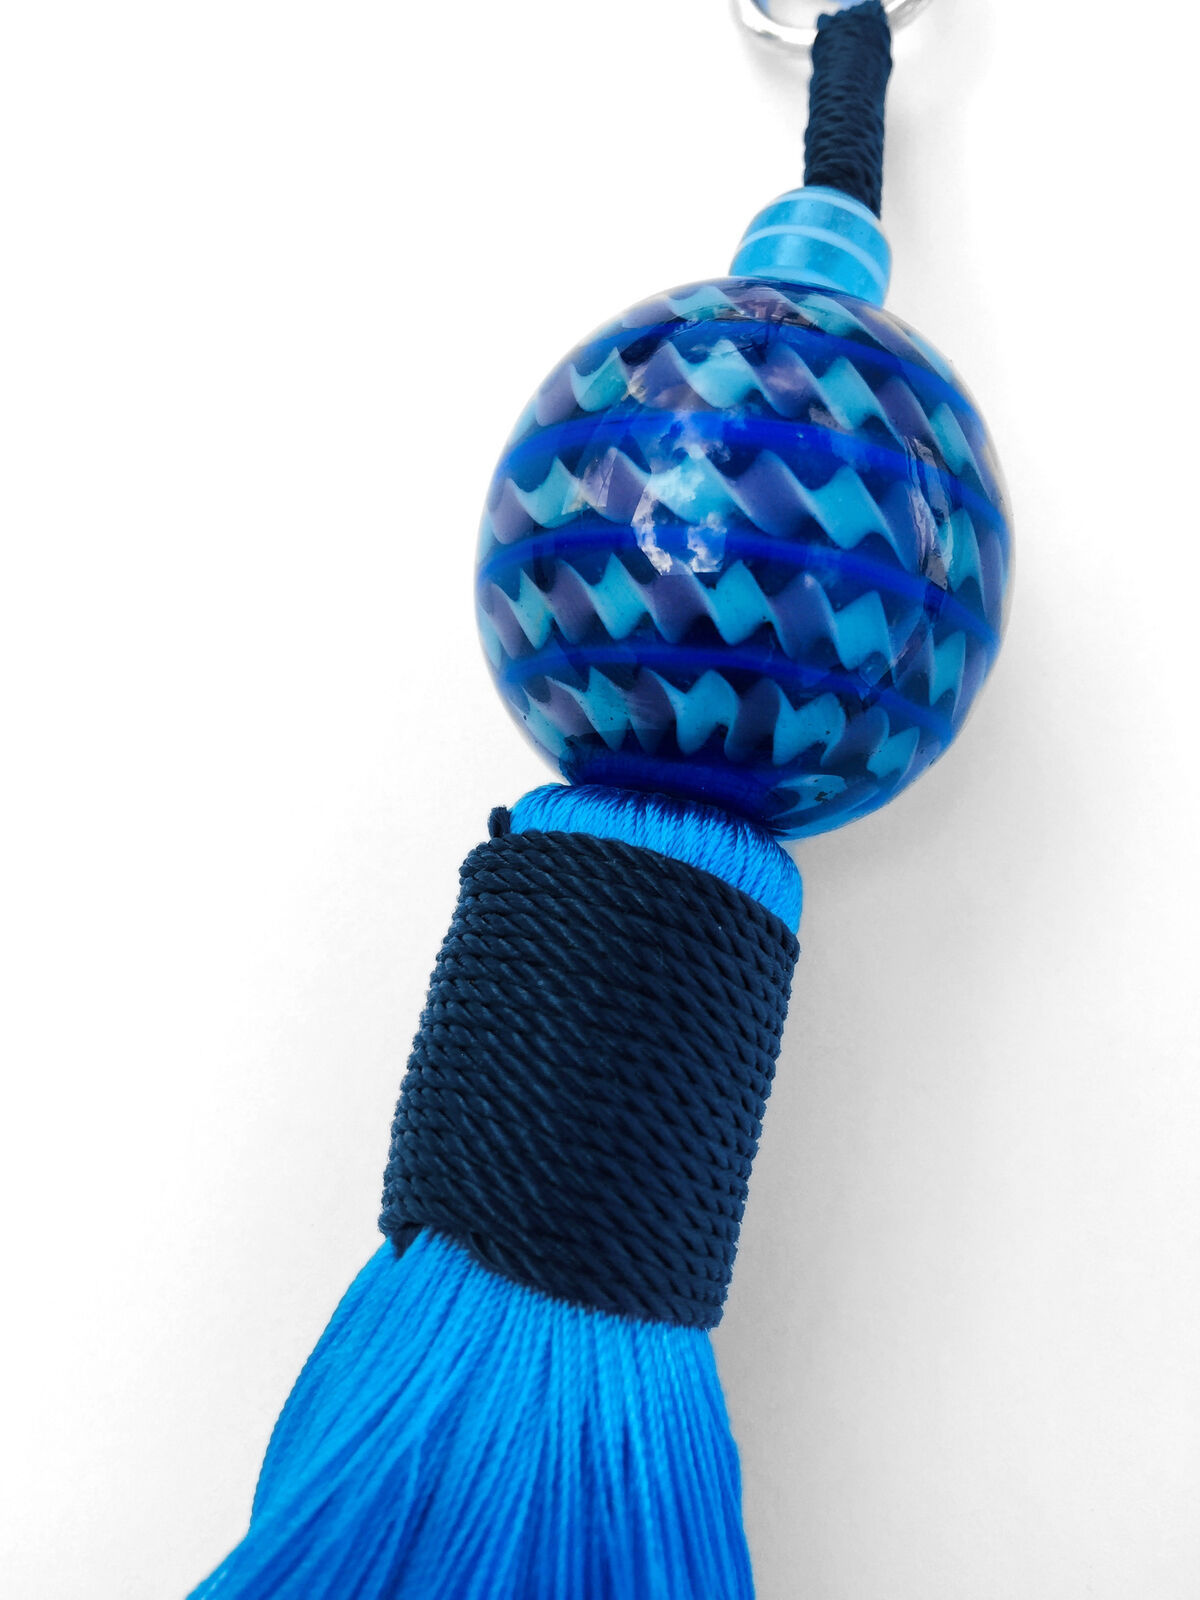 Turquoise Tassle Keychain w/Ball - Handmade in Bali